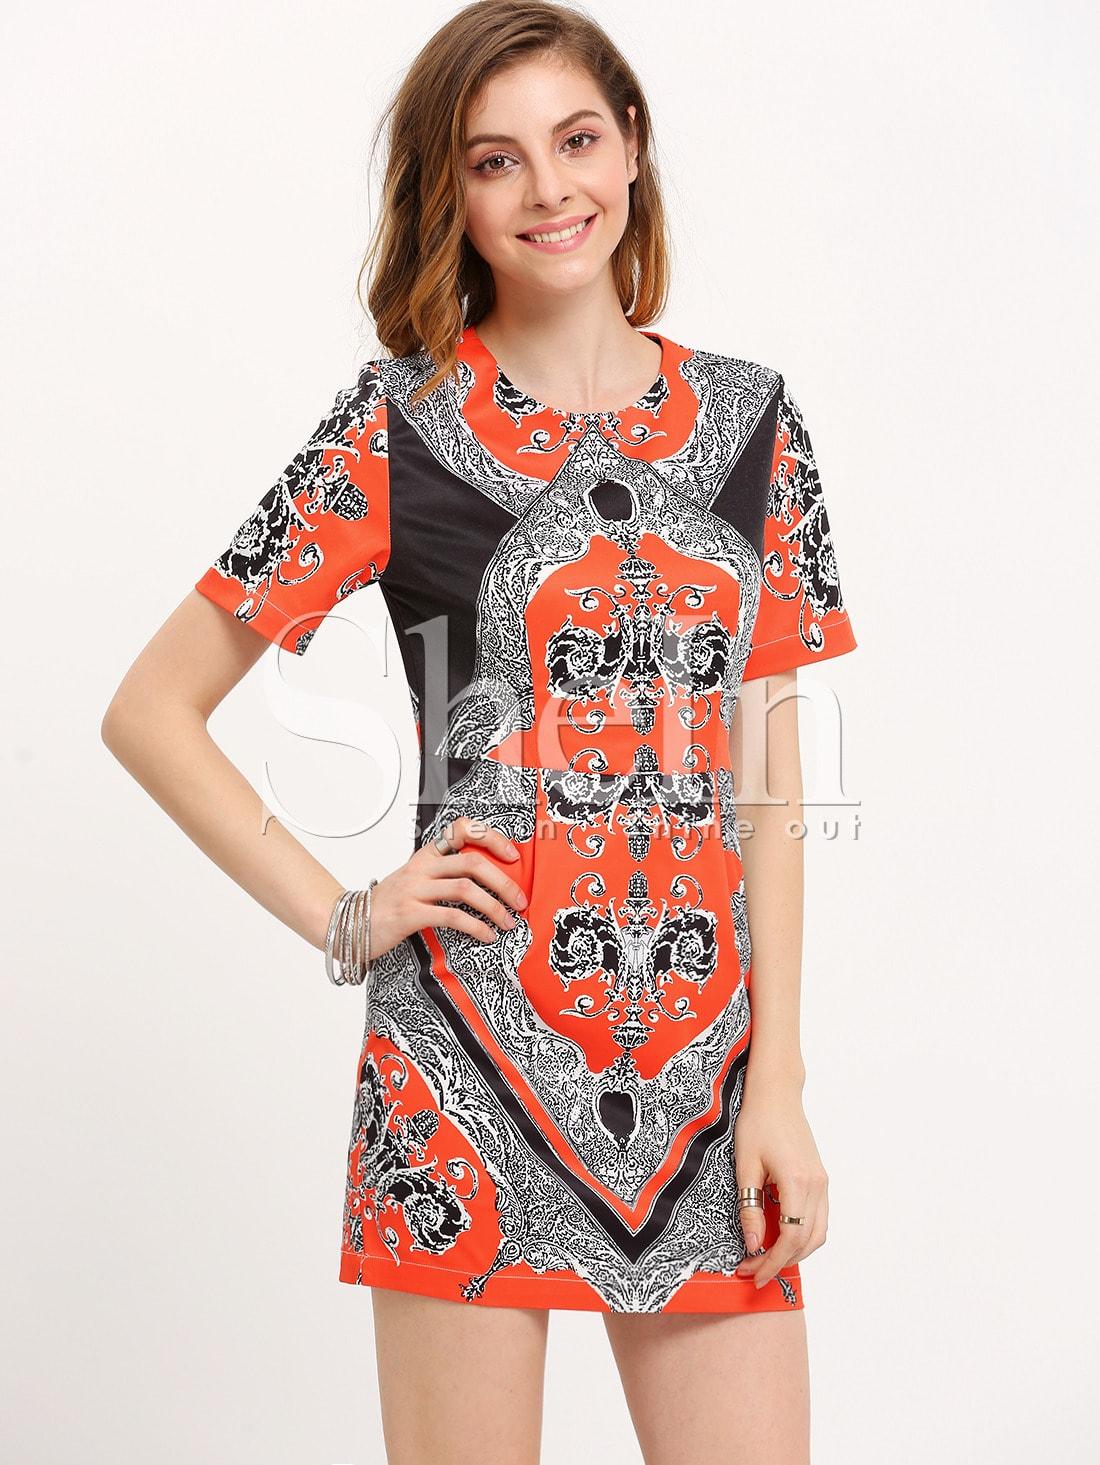 Multicolor Short Sleeve Vintage Print DressMulticolor Short Sleeve Vintage Print Dress<br><br>color: Multicolor<br>size: XS